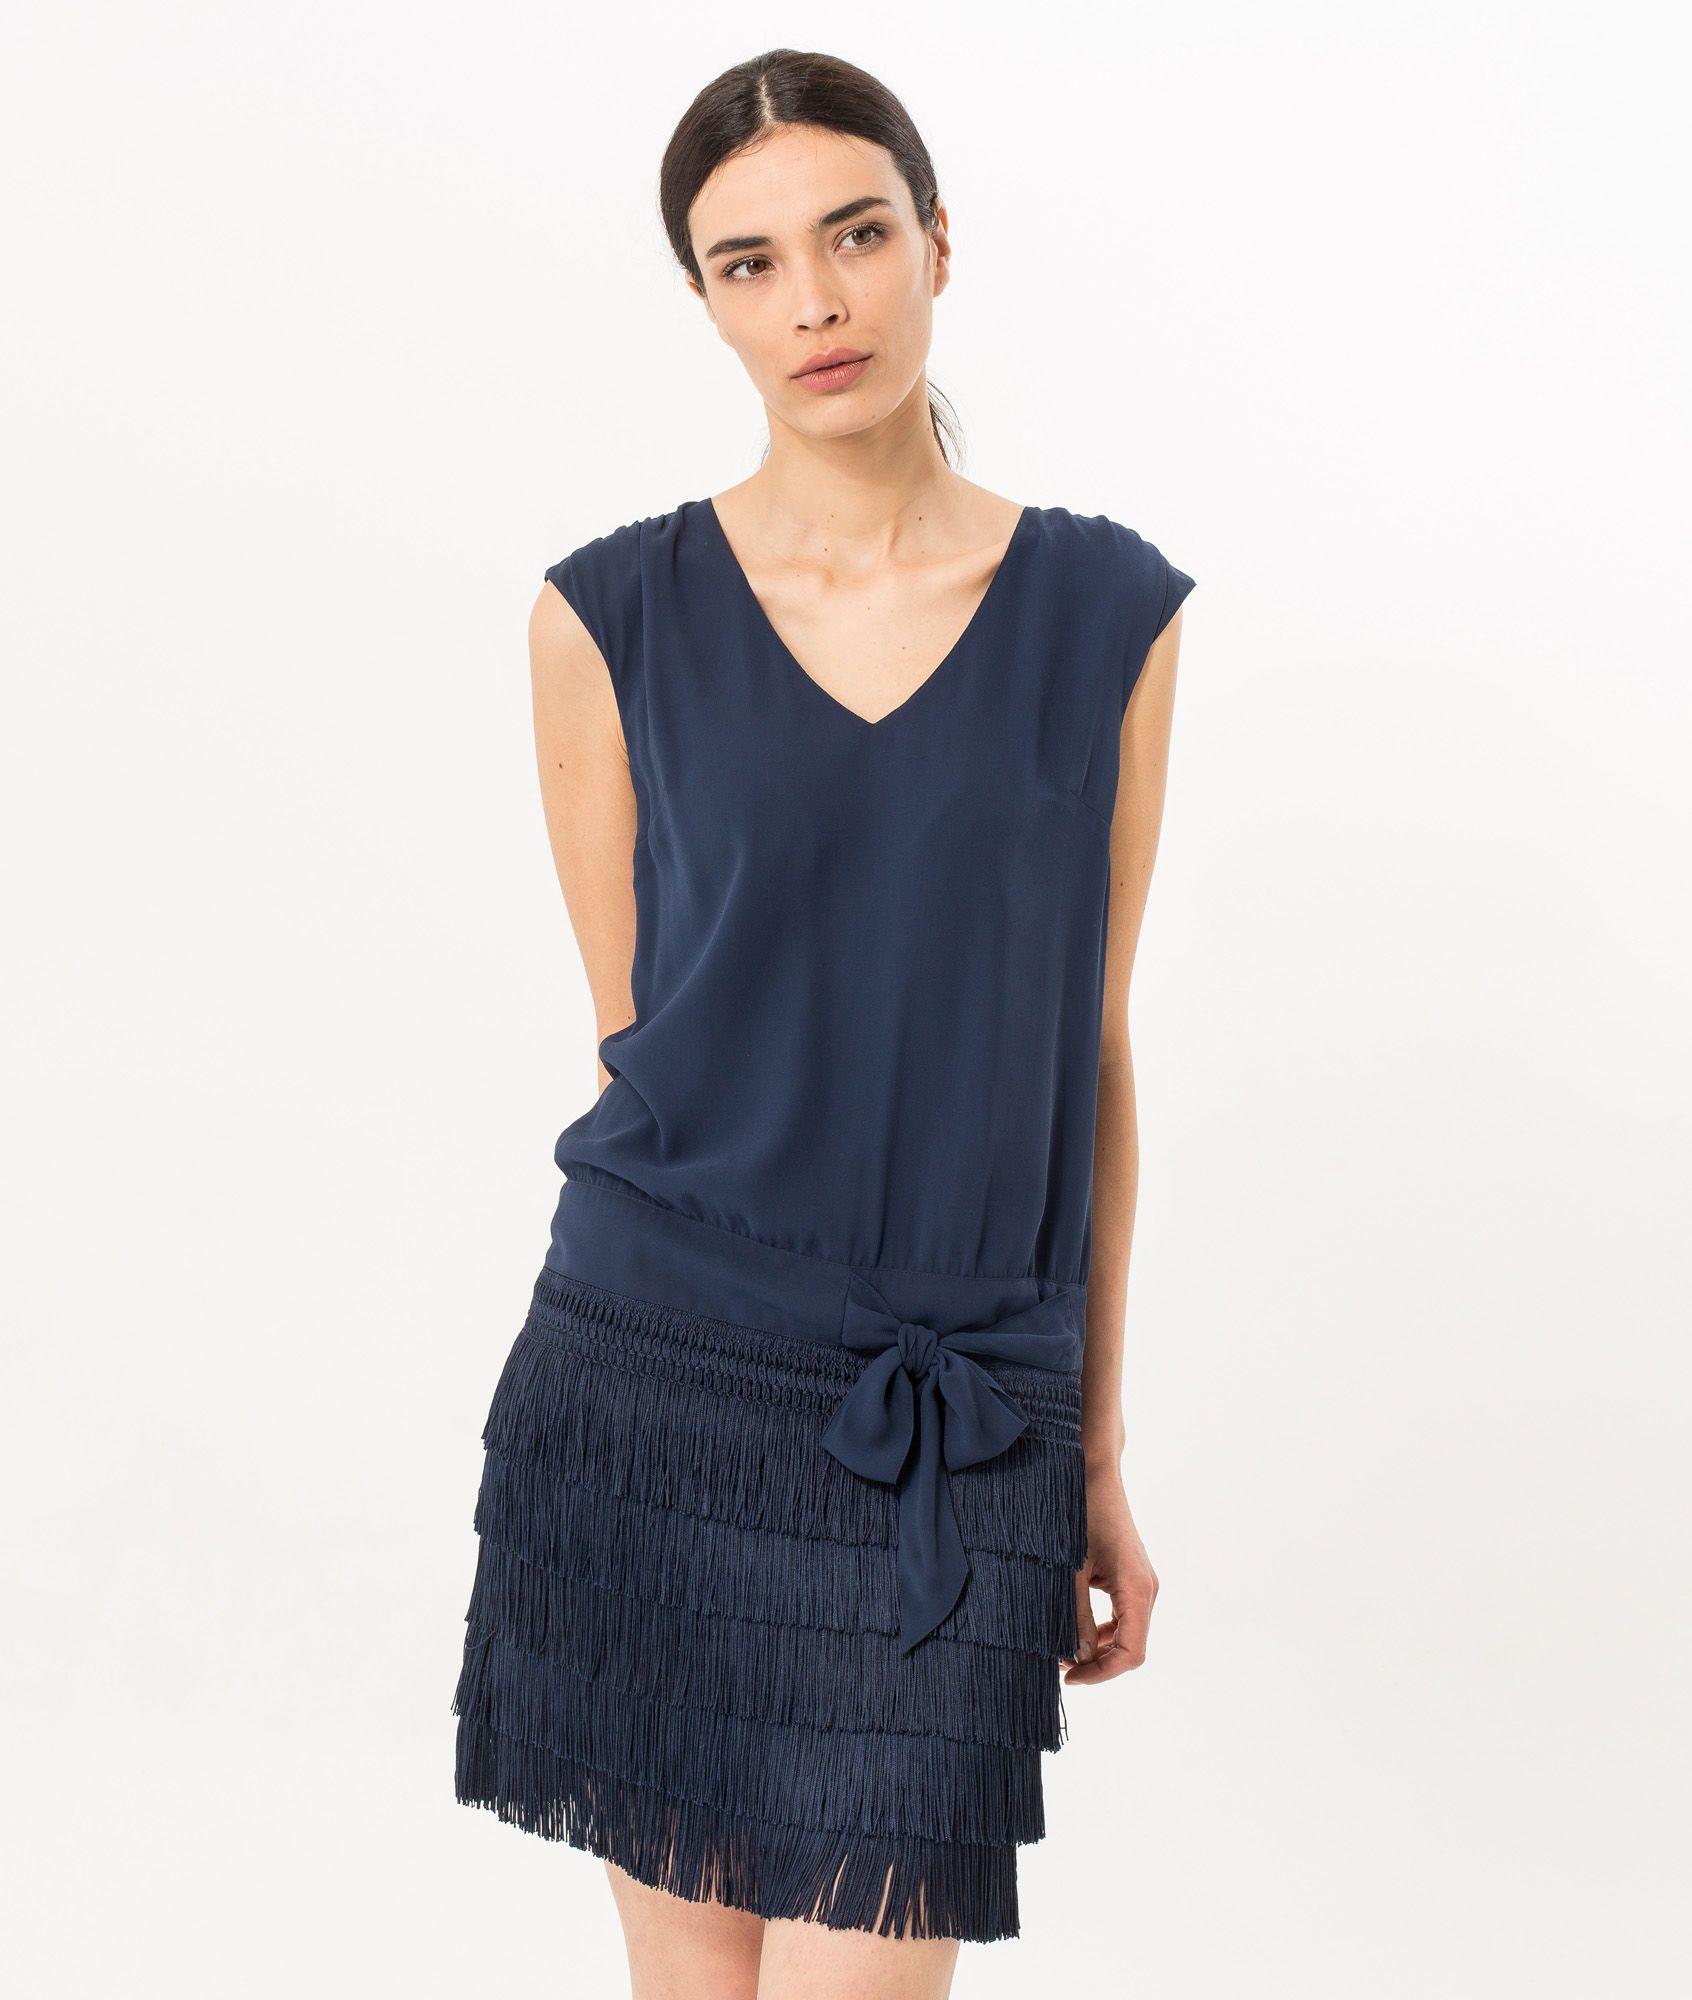 pingl par little bee sur love pinterest robes bleu. Black Bedroom Furniture Sets. Home Design Ideas